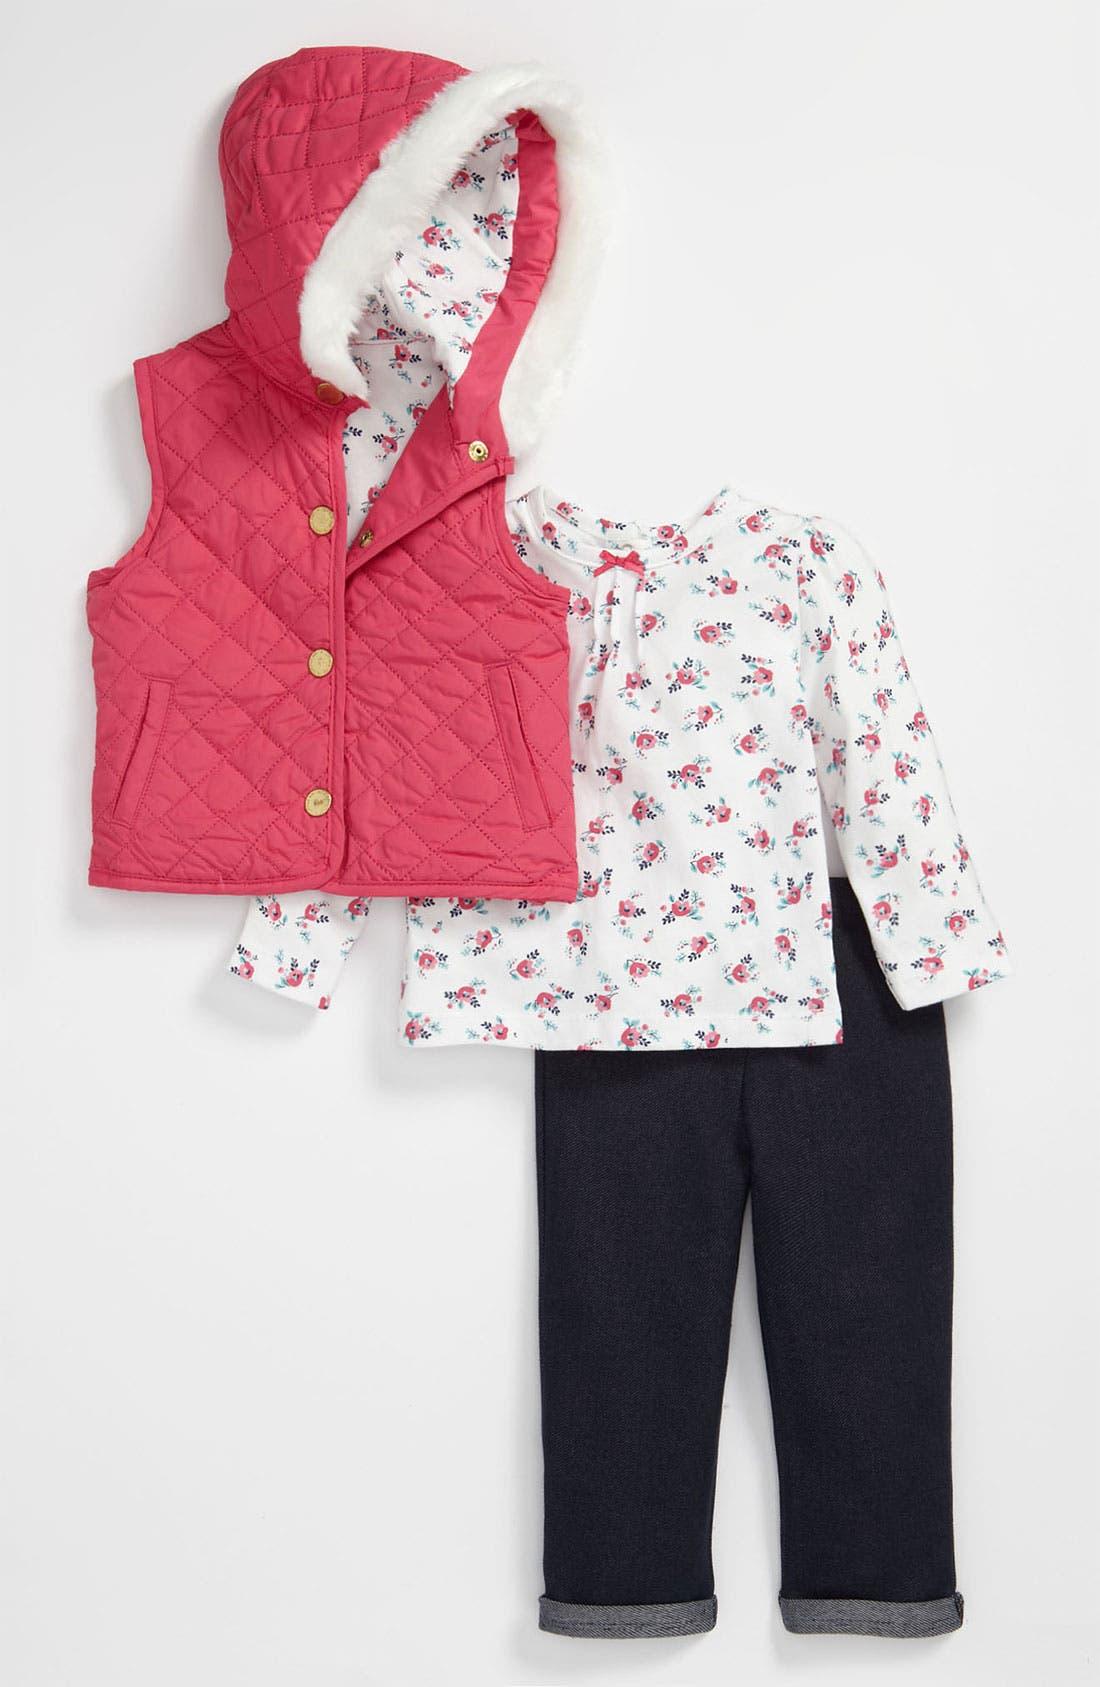 Alternate Image 1 Selected - Little Me 'Magenta' Top, Leggings & Vest (Infant)